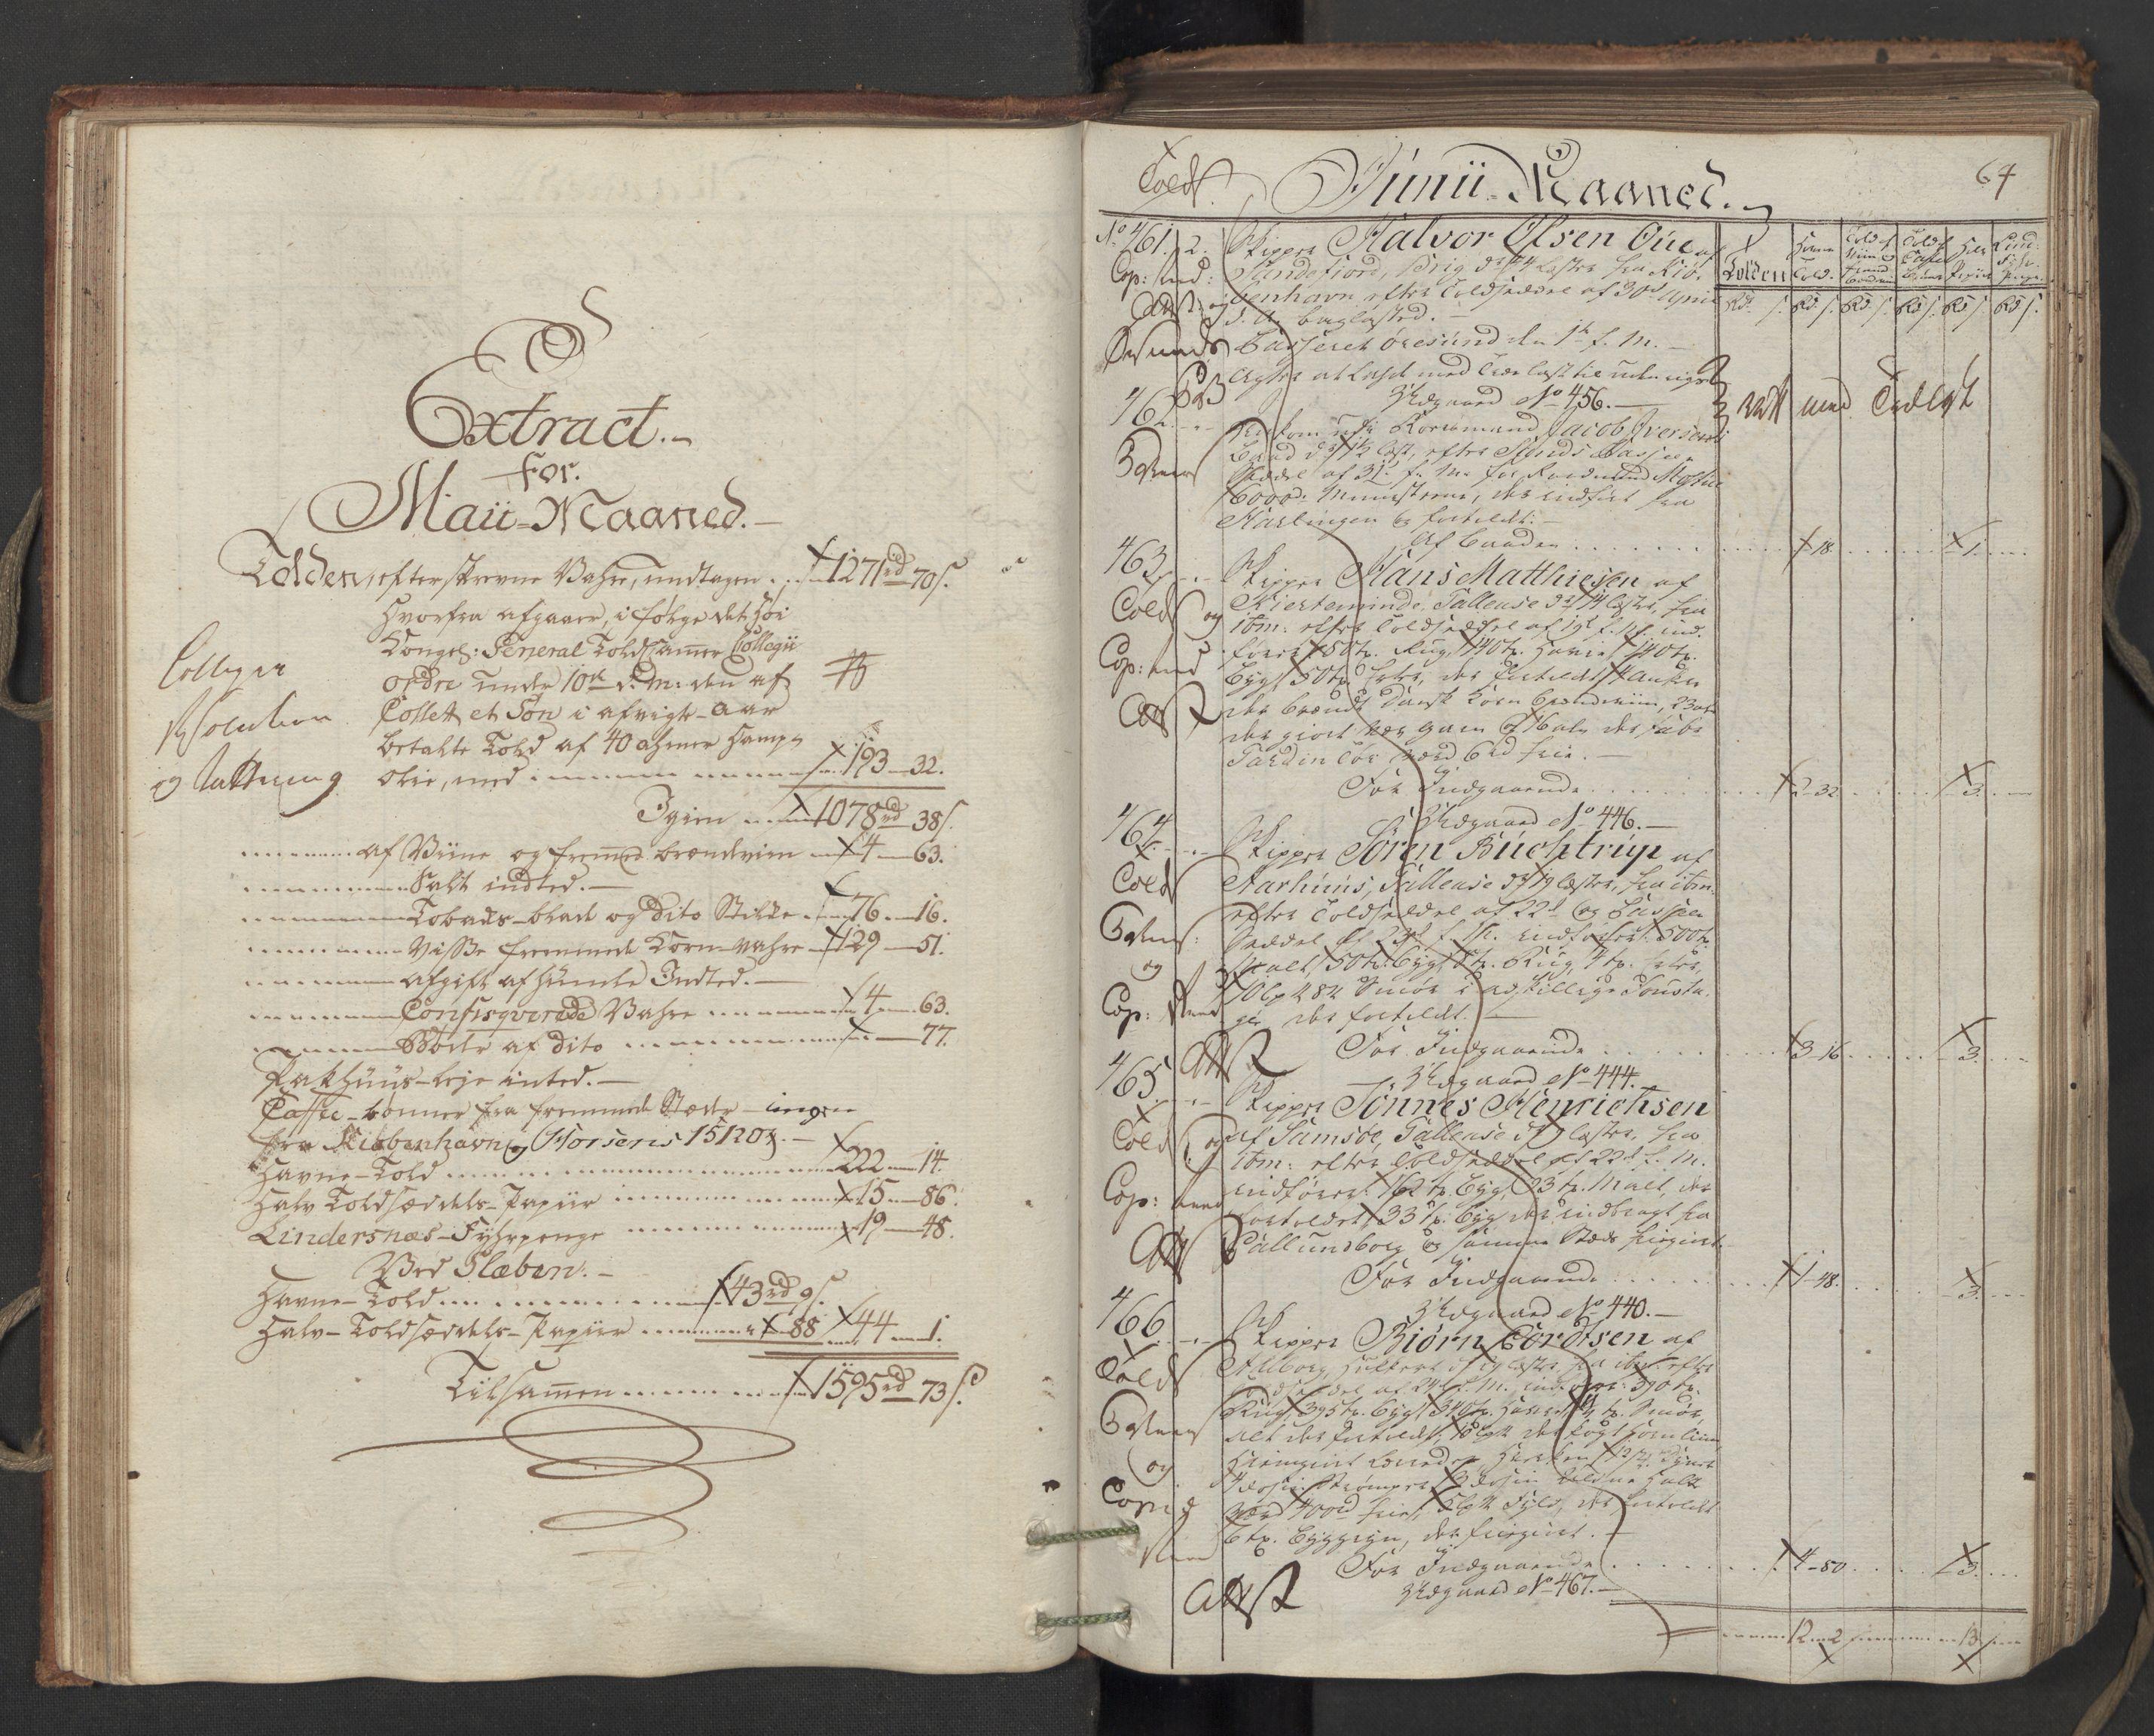 RA, Generaltollkammeret, tollregnskaper, R06/L0173: Tollregnskaper Kristiania, 1788, s. 63b-64a